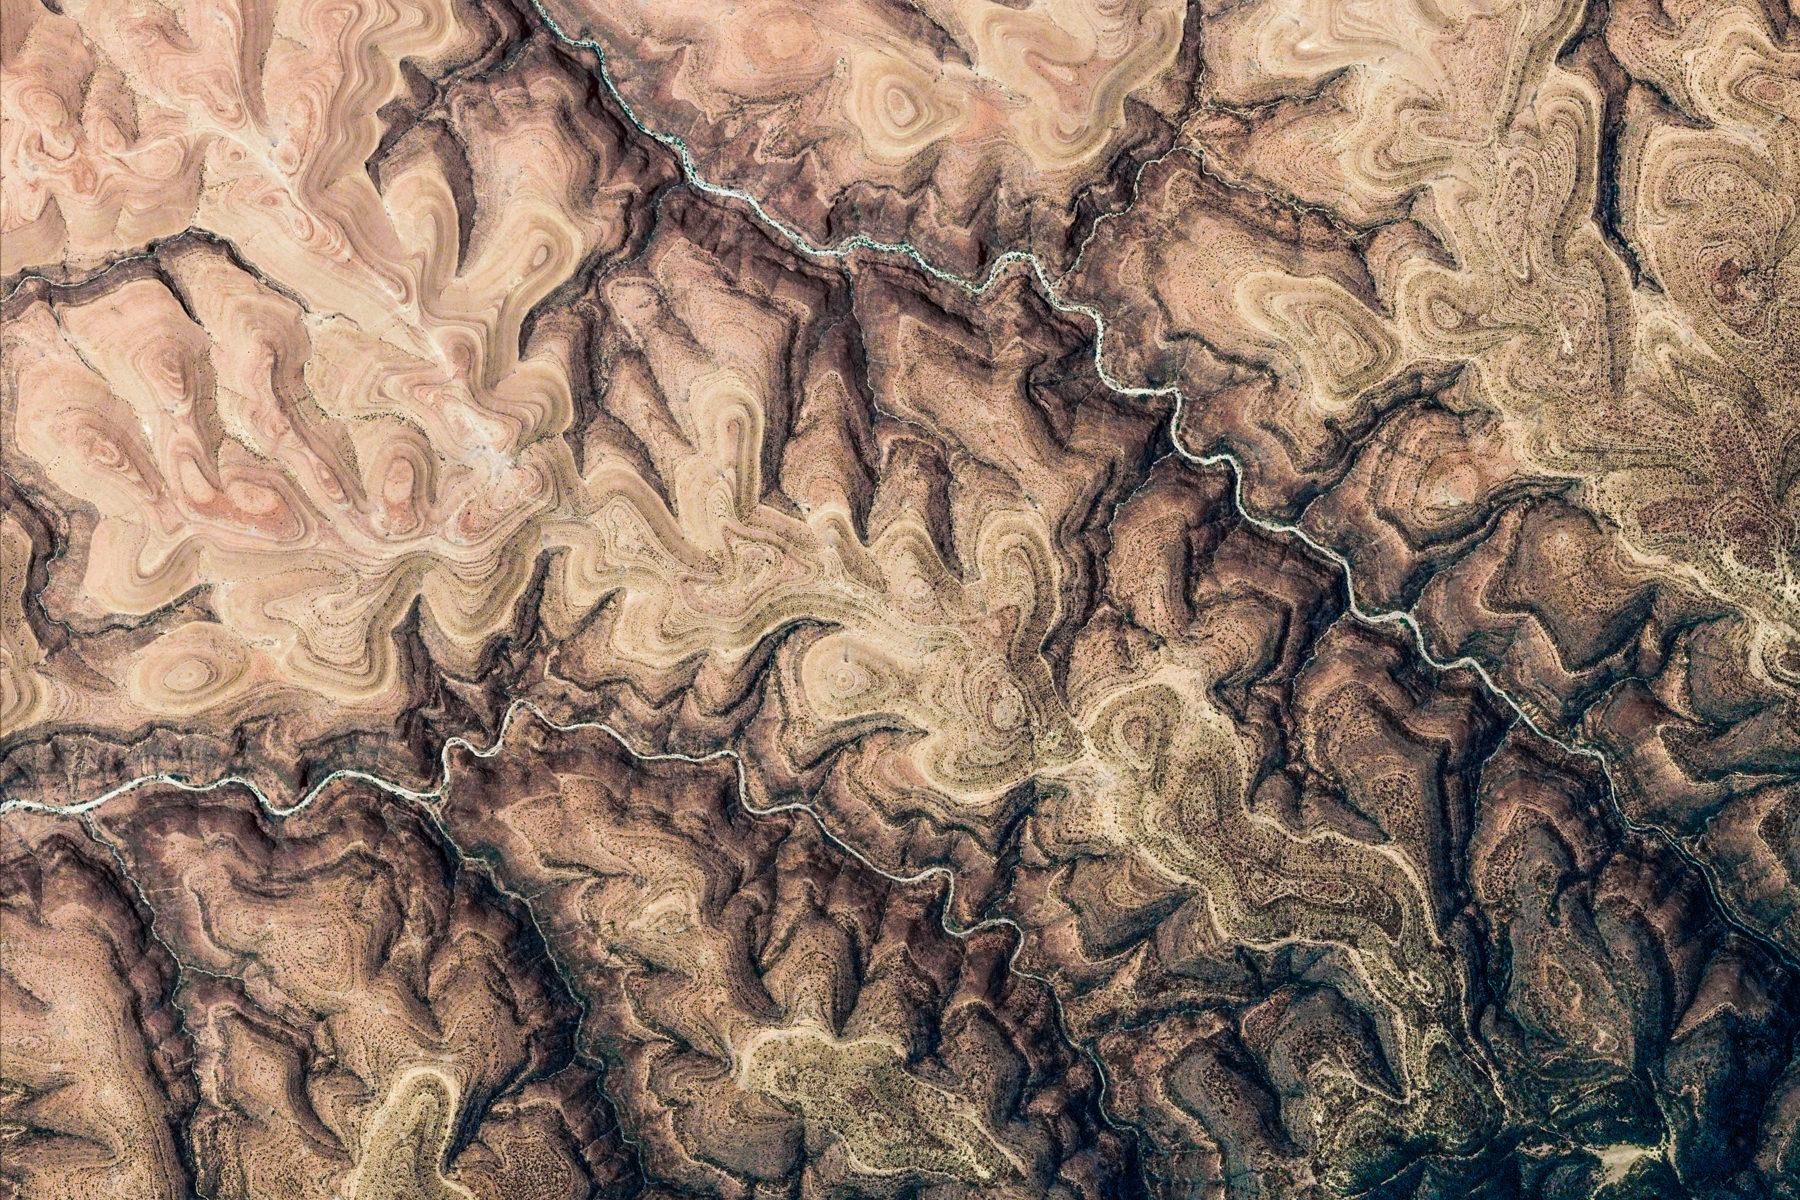 google-earth-Somalia-Badhan-11934